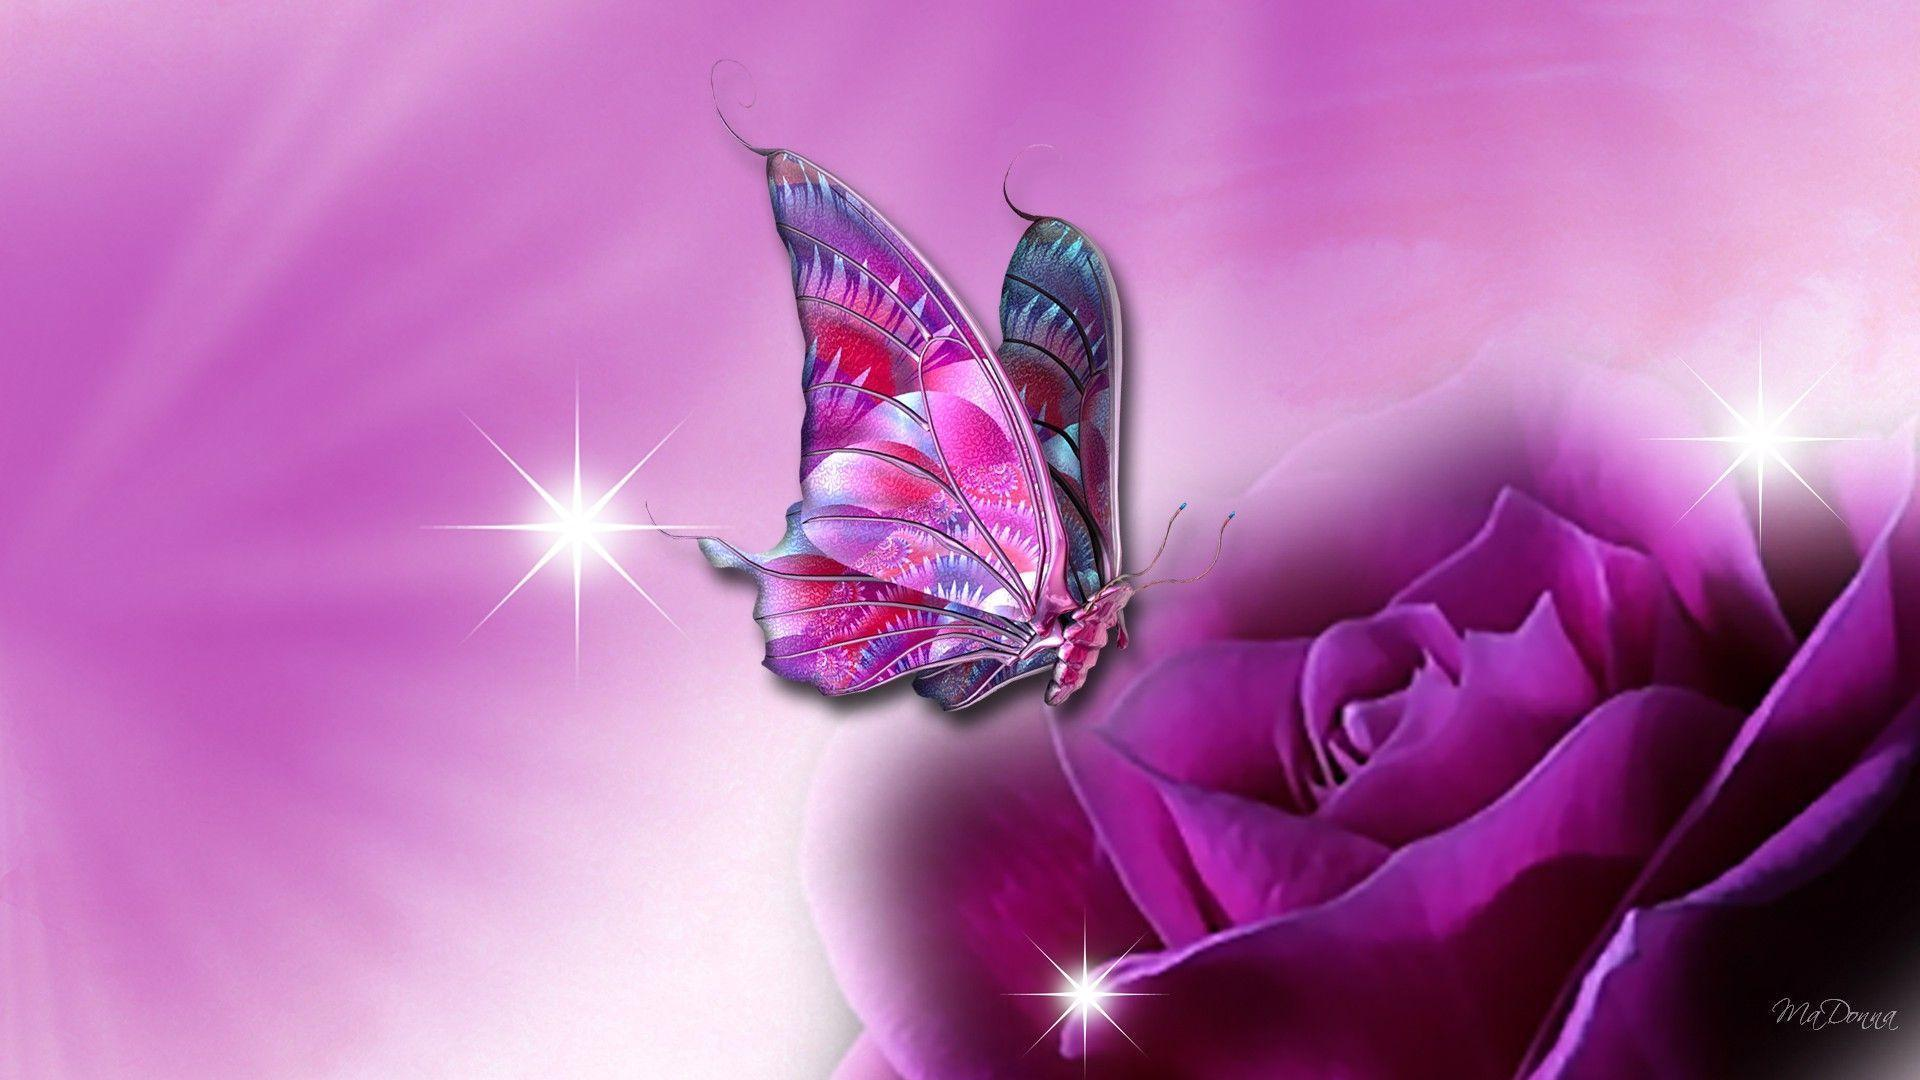 wallpapers | ... Wallpapers, Download Free Butterflies Wallpaper ...